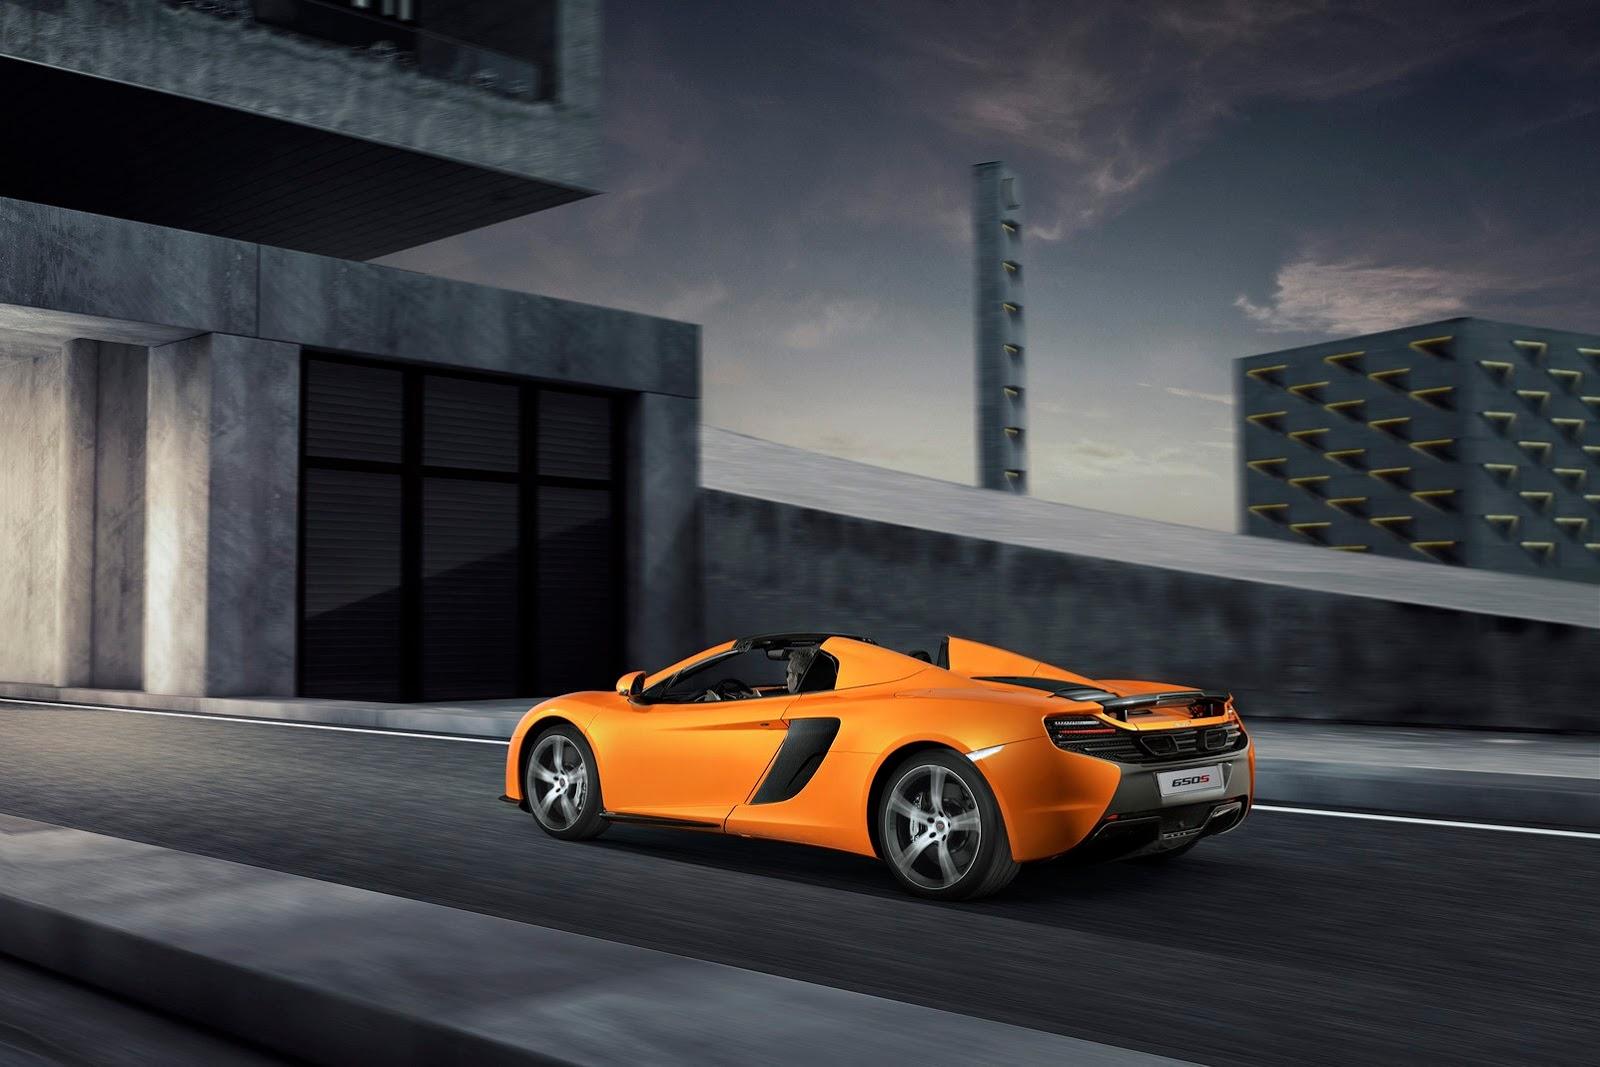 McLaren-65-S-5%25255B2%25255D.jpg